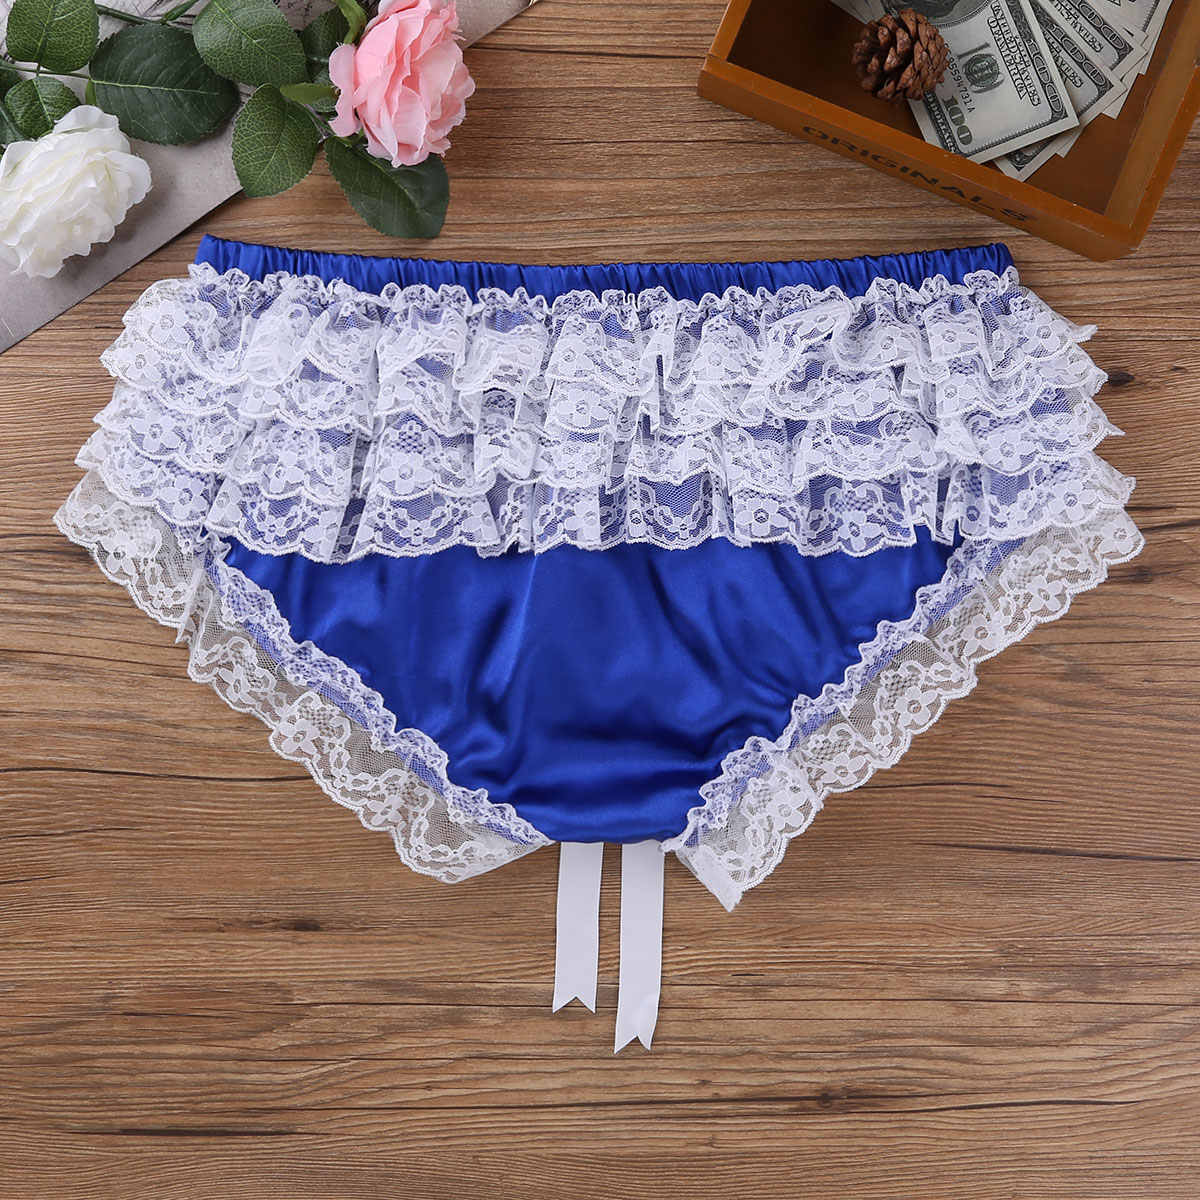 bb3f0decef9a ... Soft Lace Floral Briefs Gay Men Underwear Sexy Jockstrap Cute Thongs  Bowknot G strings Homme Panties